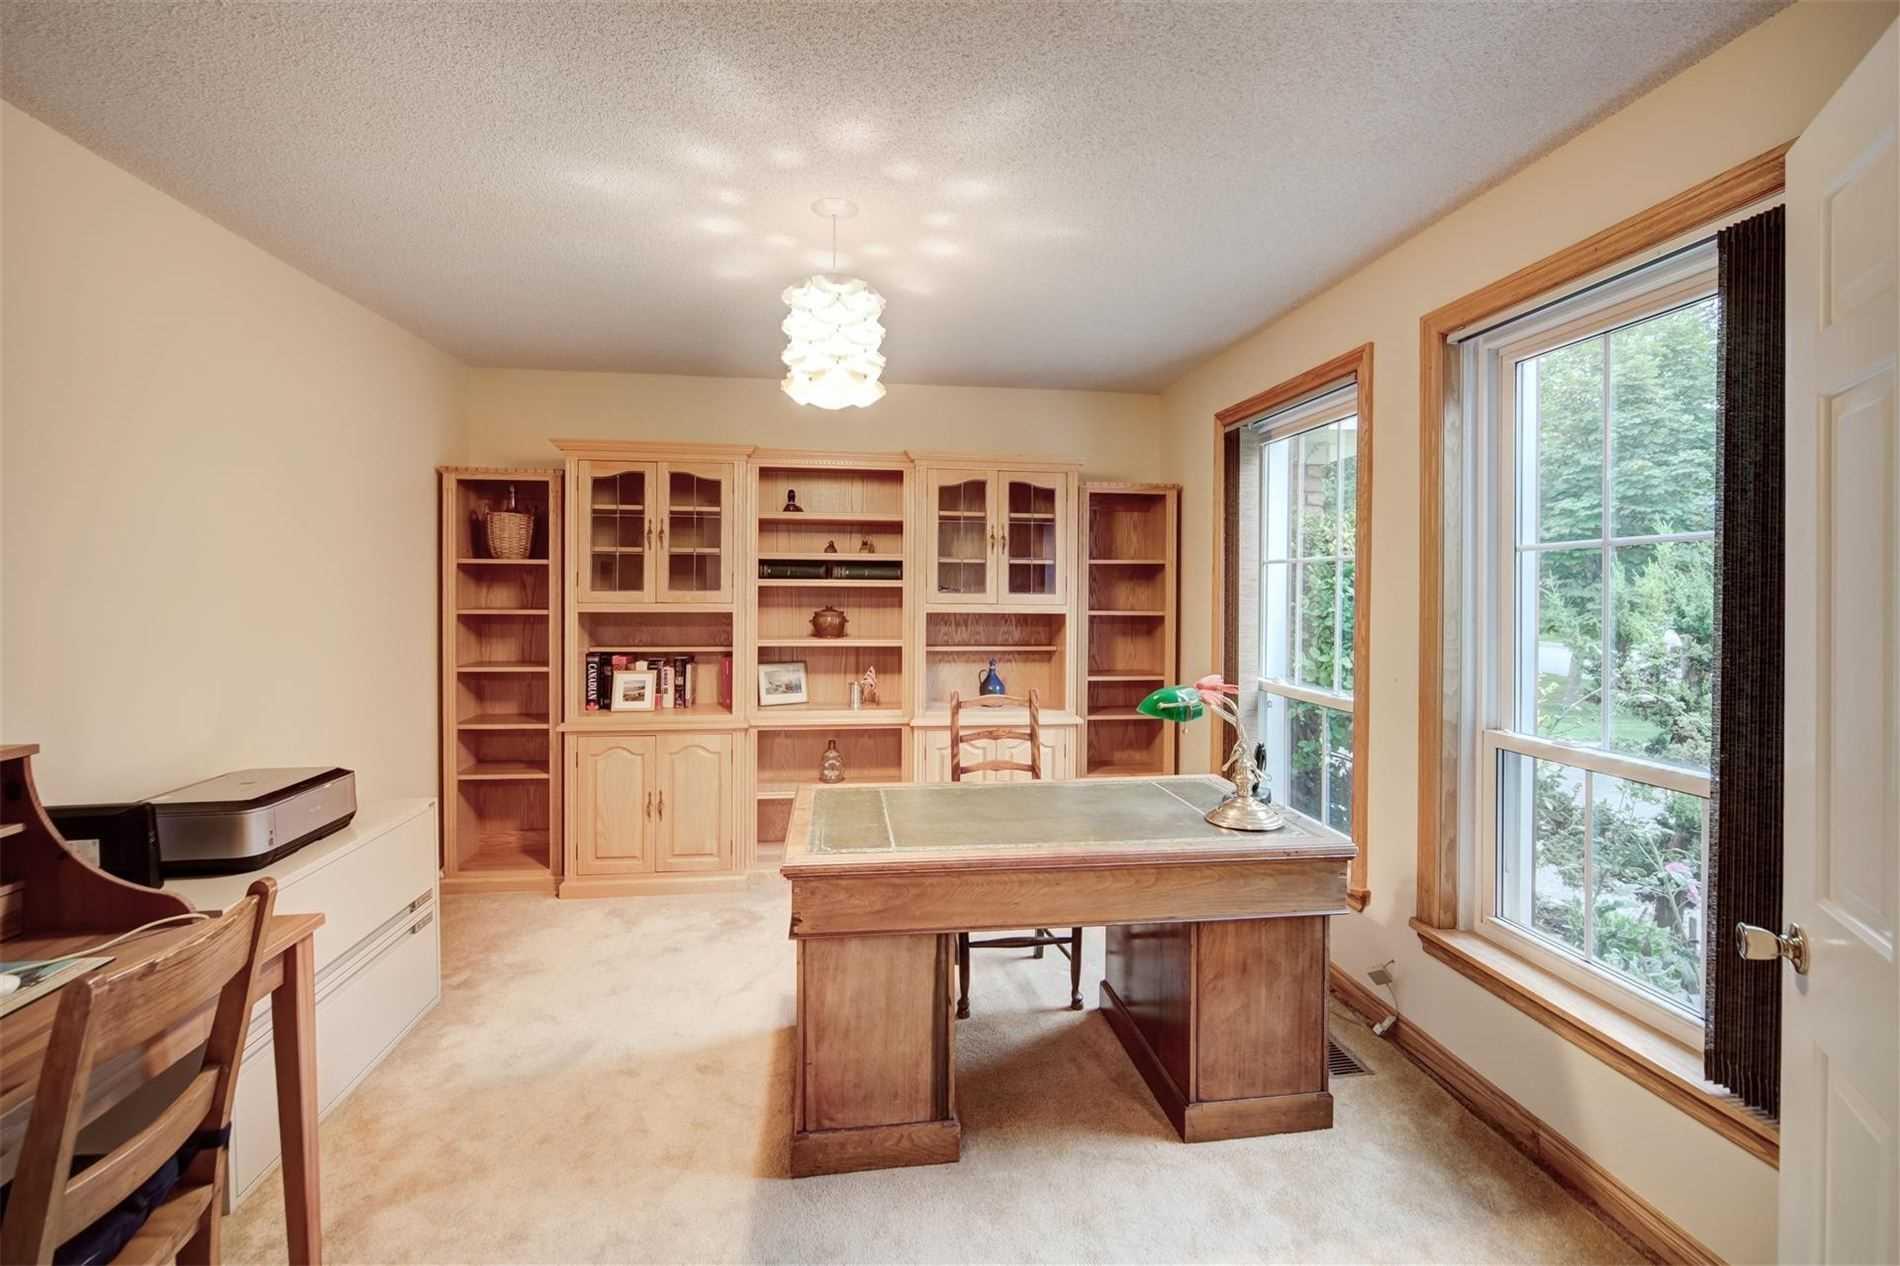 88 Hillside Dr, Brampton, Ontario (ID W4906855)